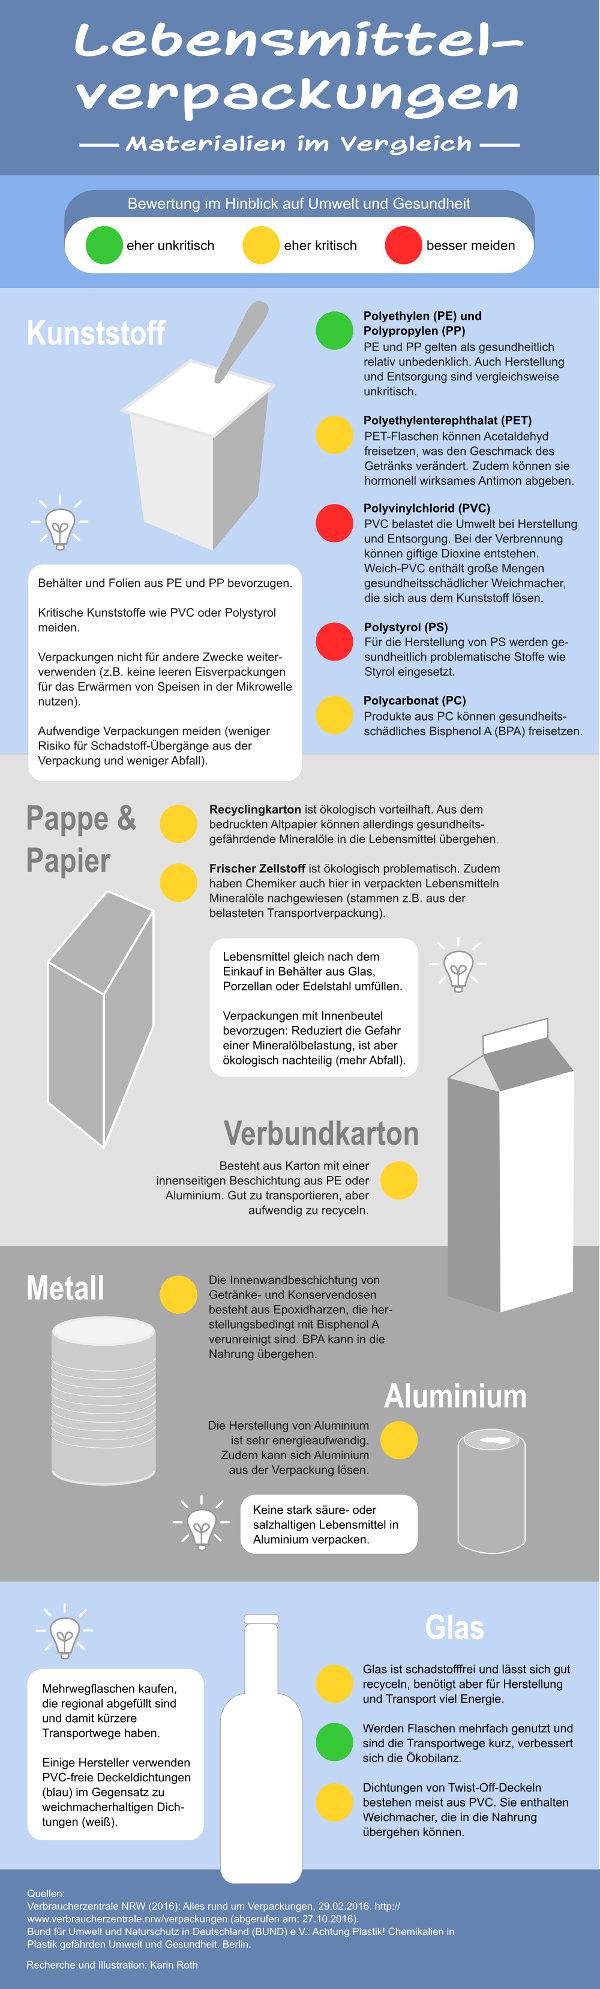 Infografik Lebensmittelverpackungen